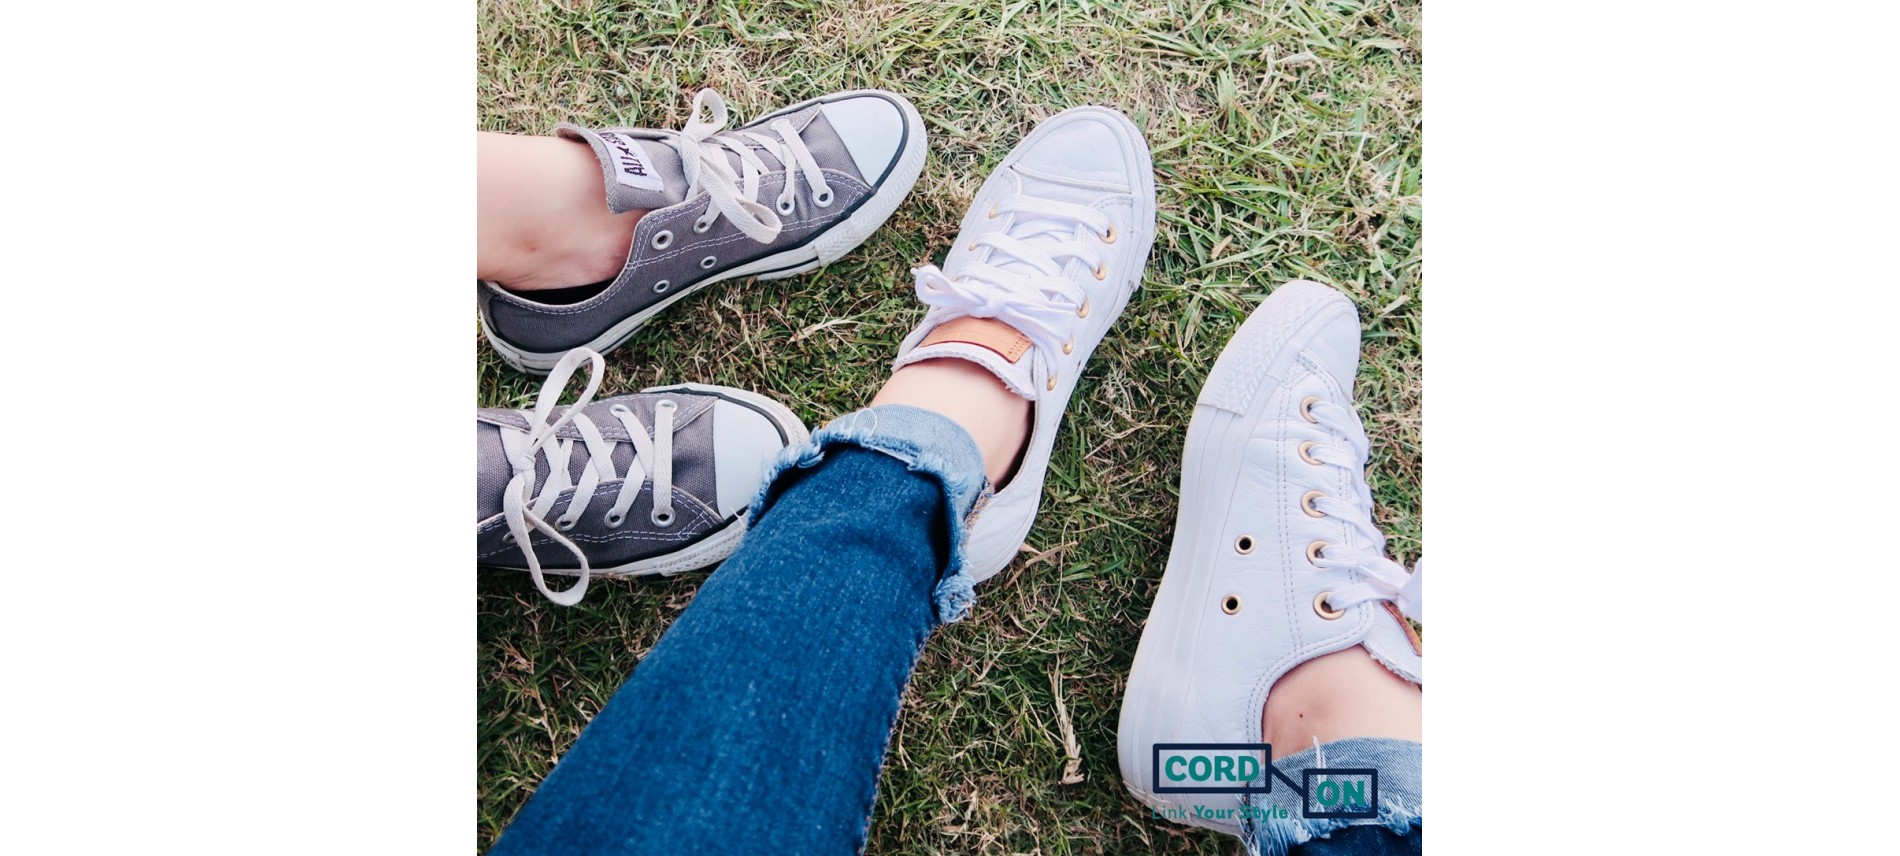 Cordones para calzado urbano